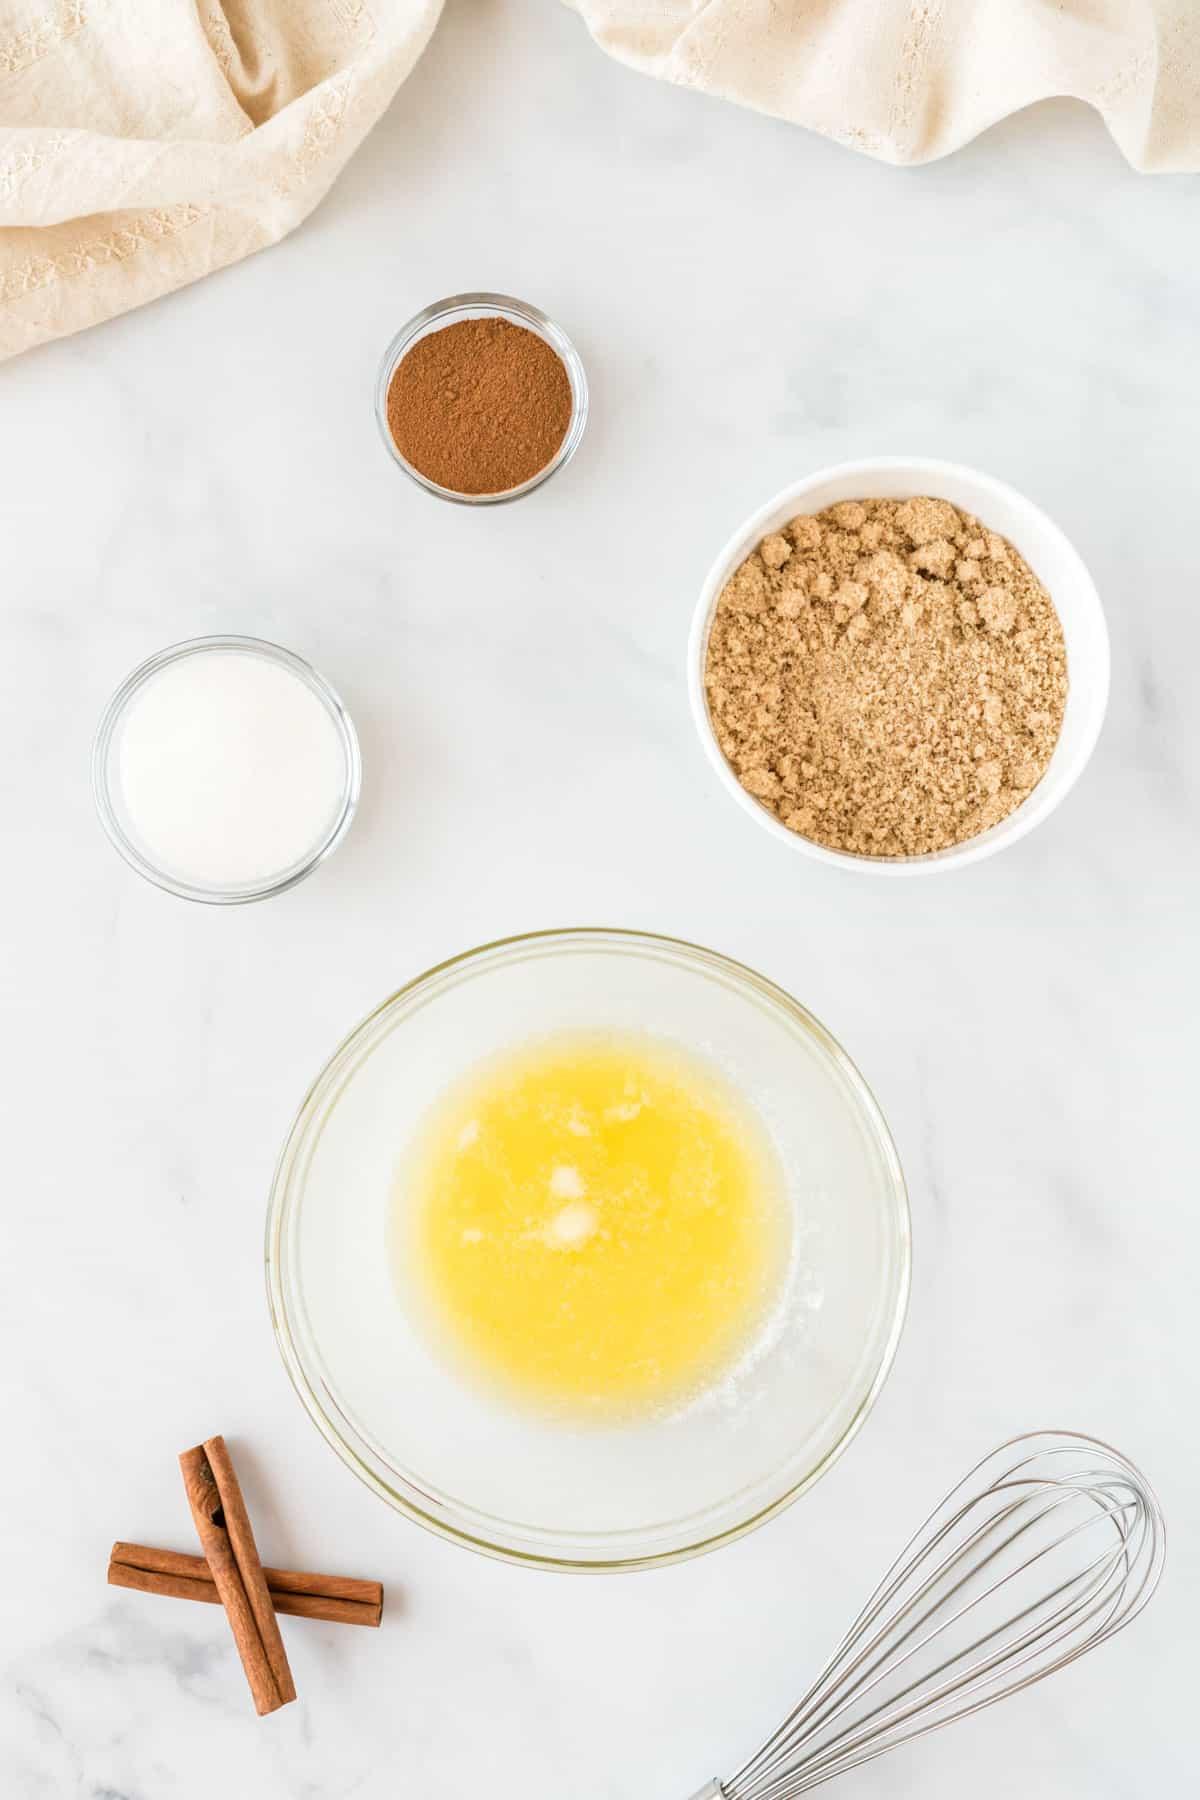 ingredients to make the cinnamon sugar